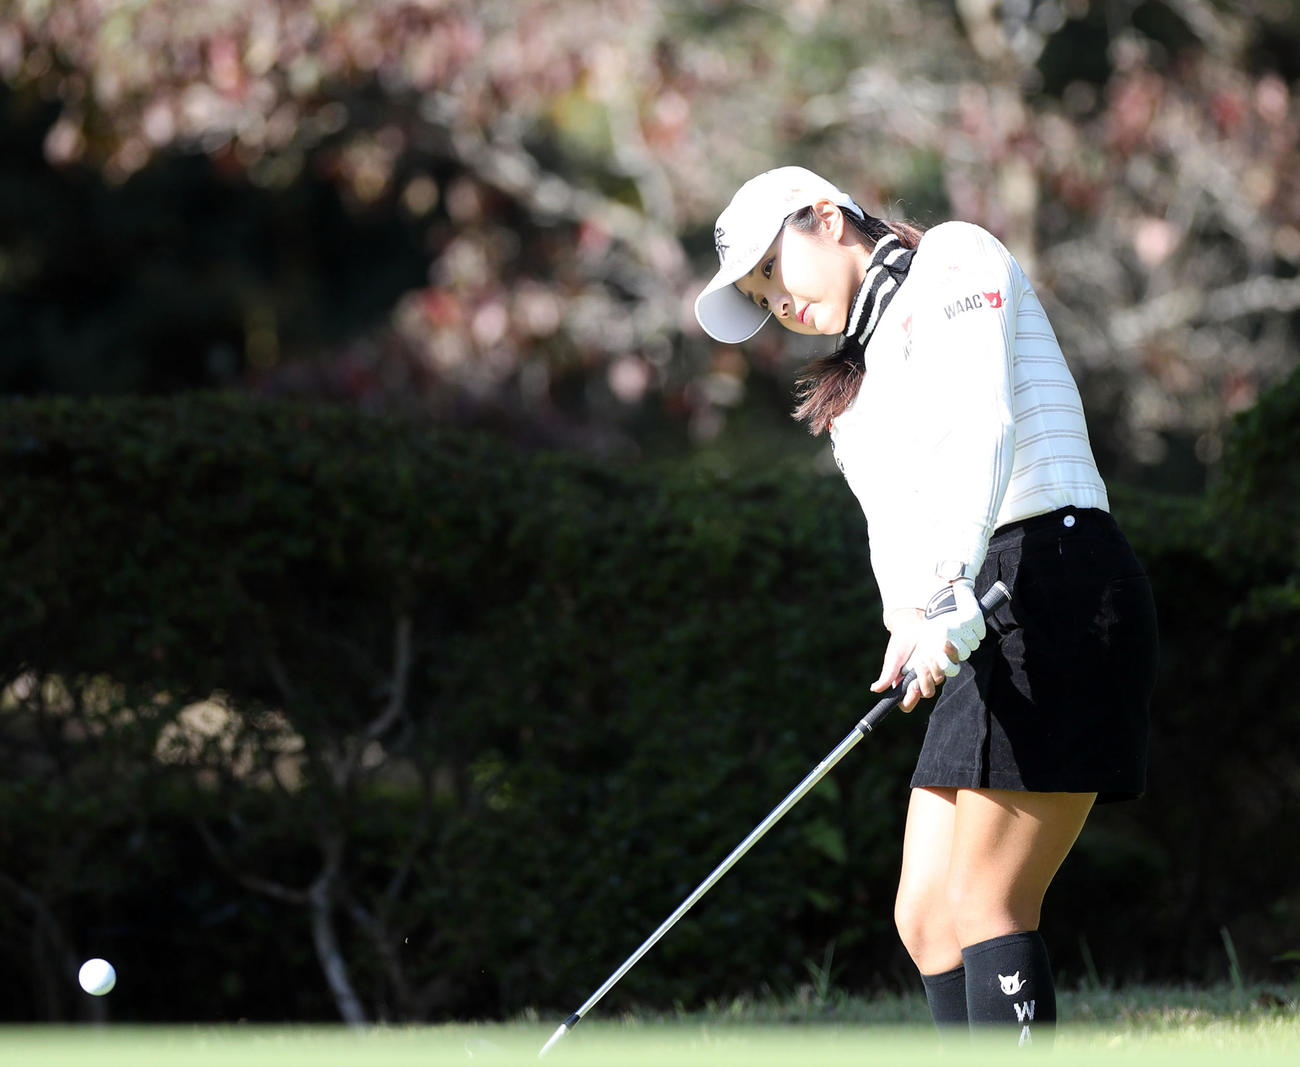 https://www.nikkansports.com/sports/golf/news/img/202011050000106-w1300_21.jpg